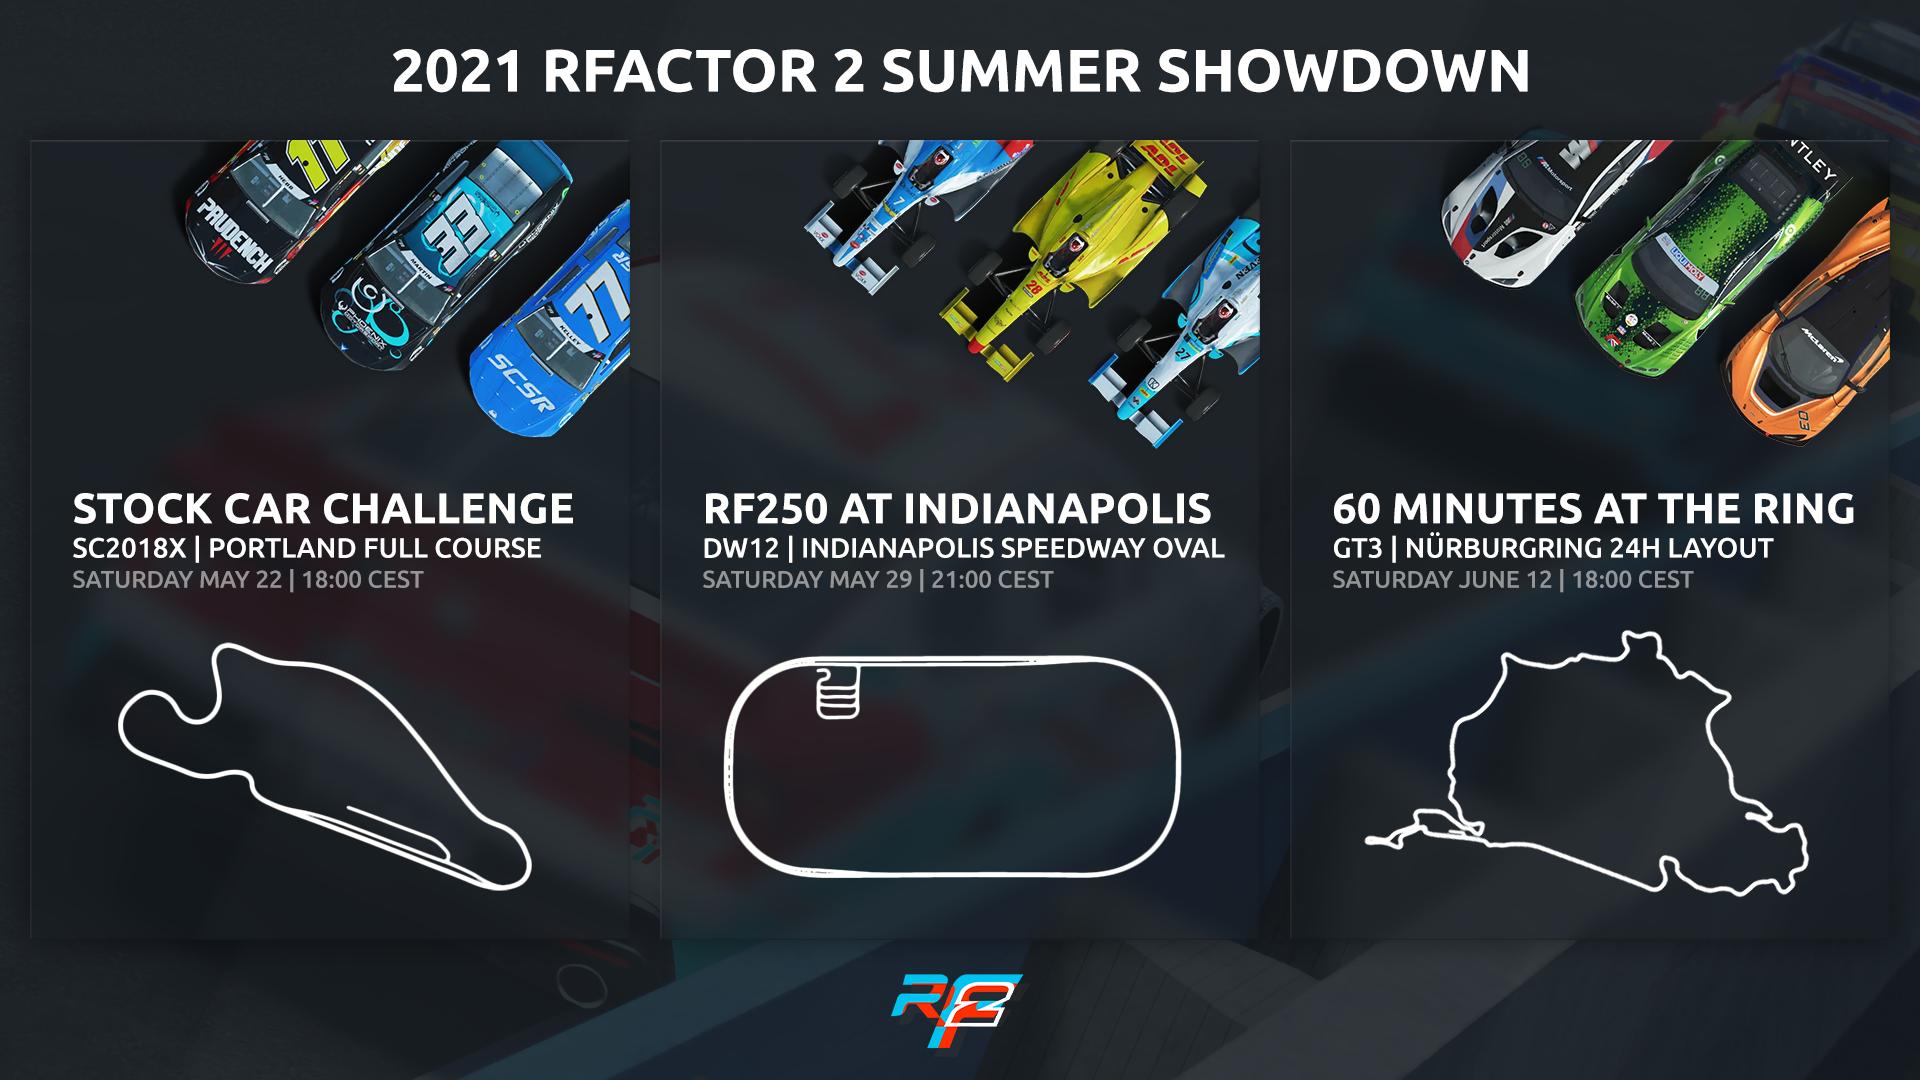 rFactor-2-summer-showdown-poster-1-1.png